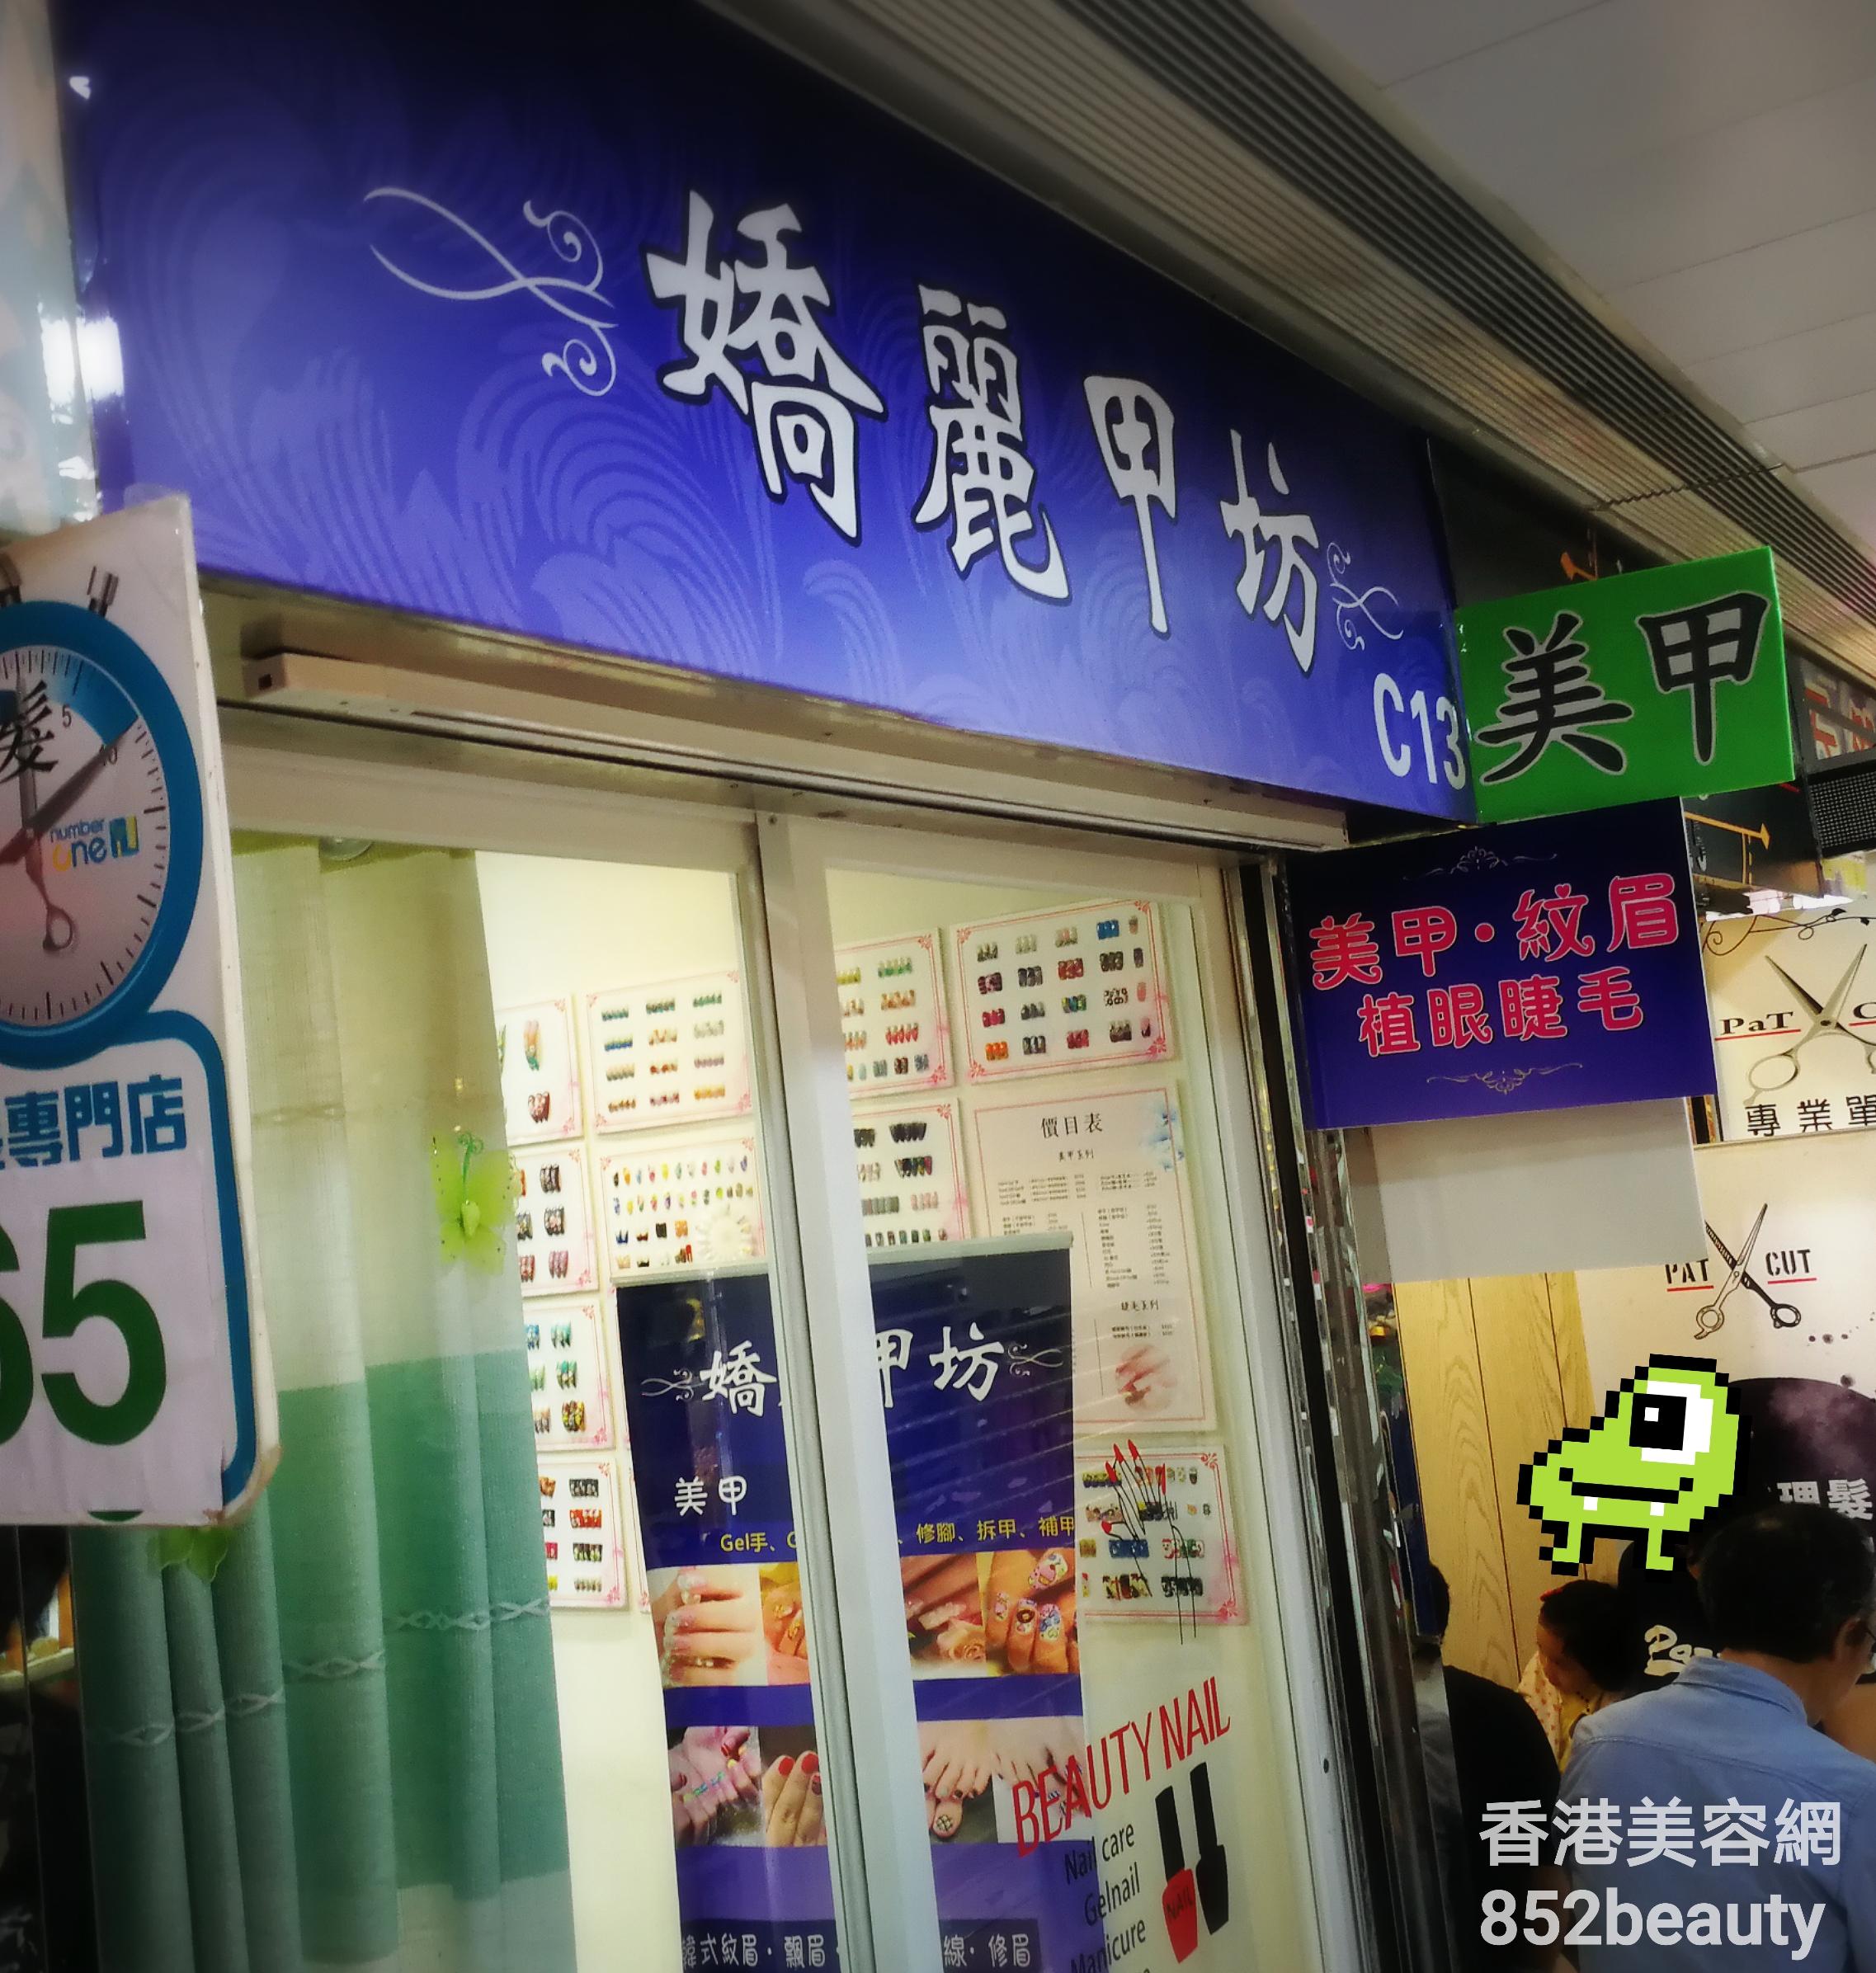 香港美容院 美容師 : Love Fashion Nails 嬌麗甲坊 @青年創業軍